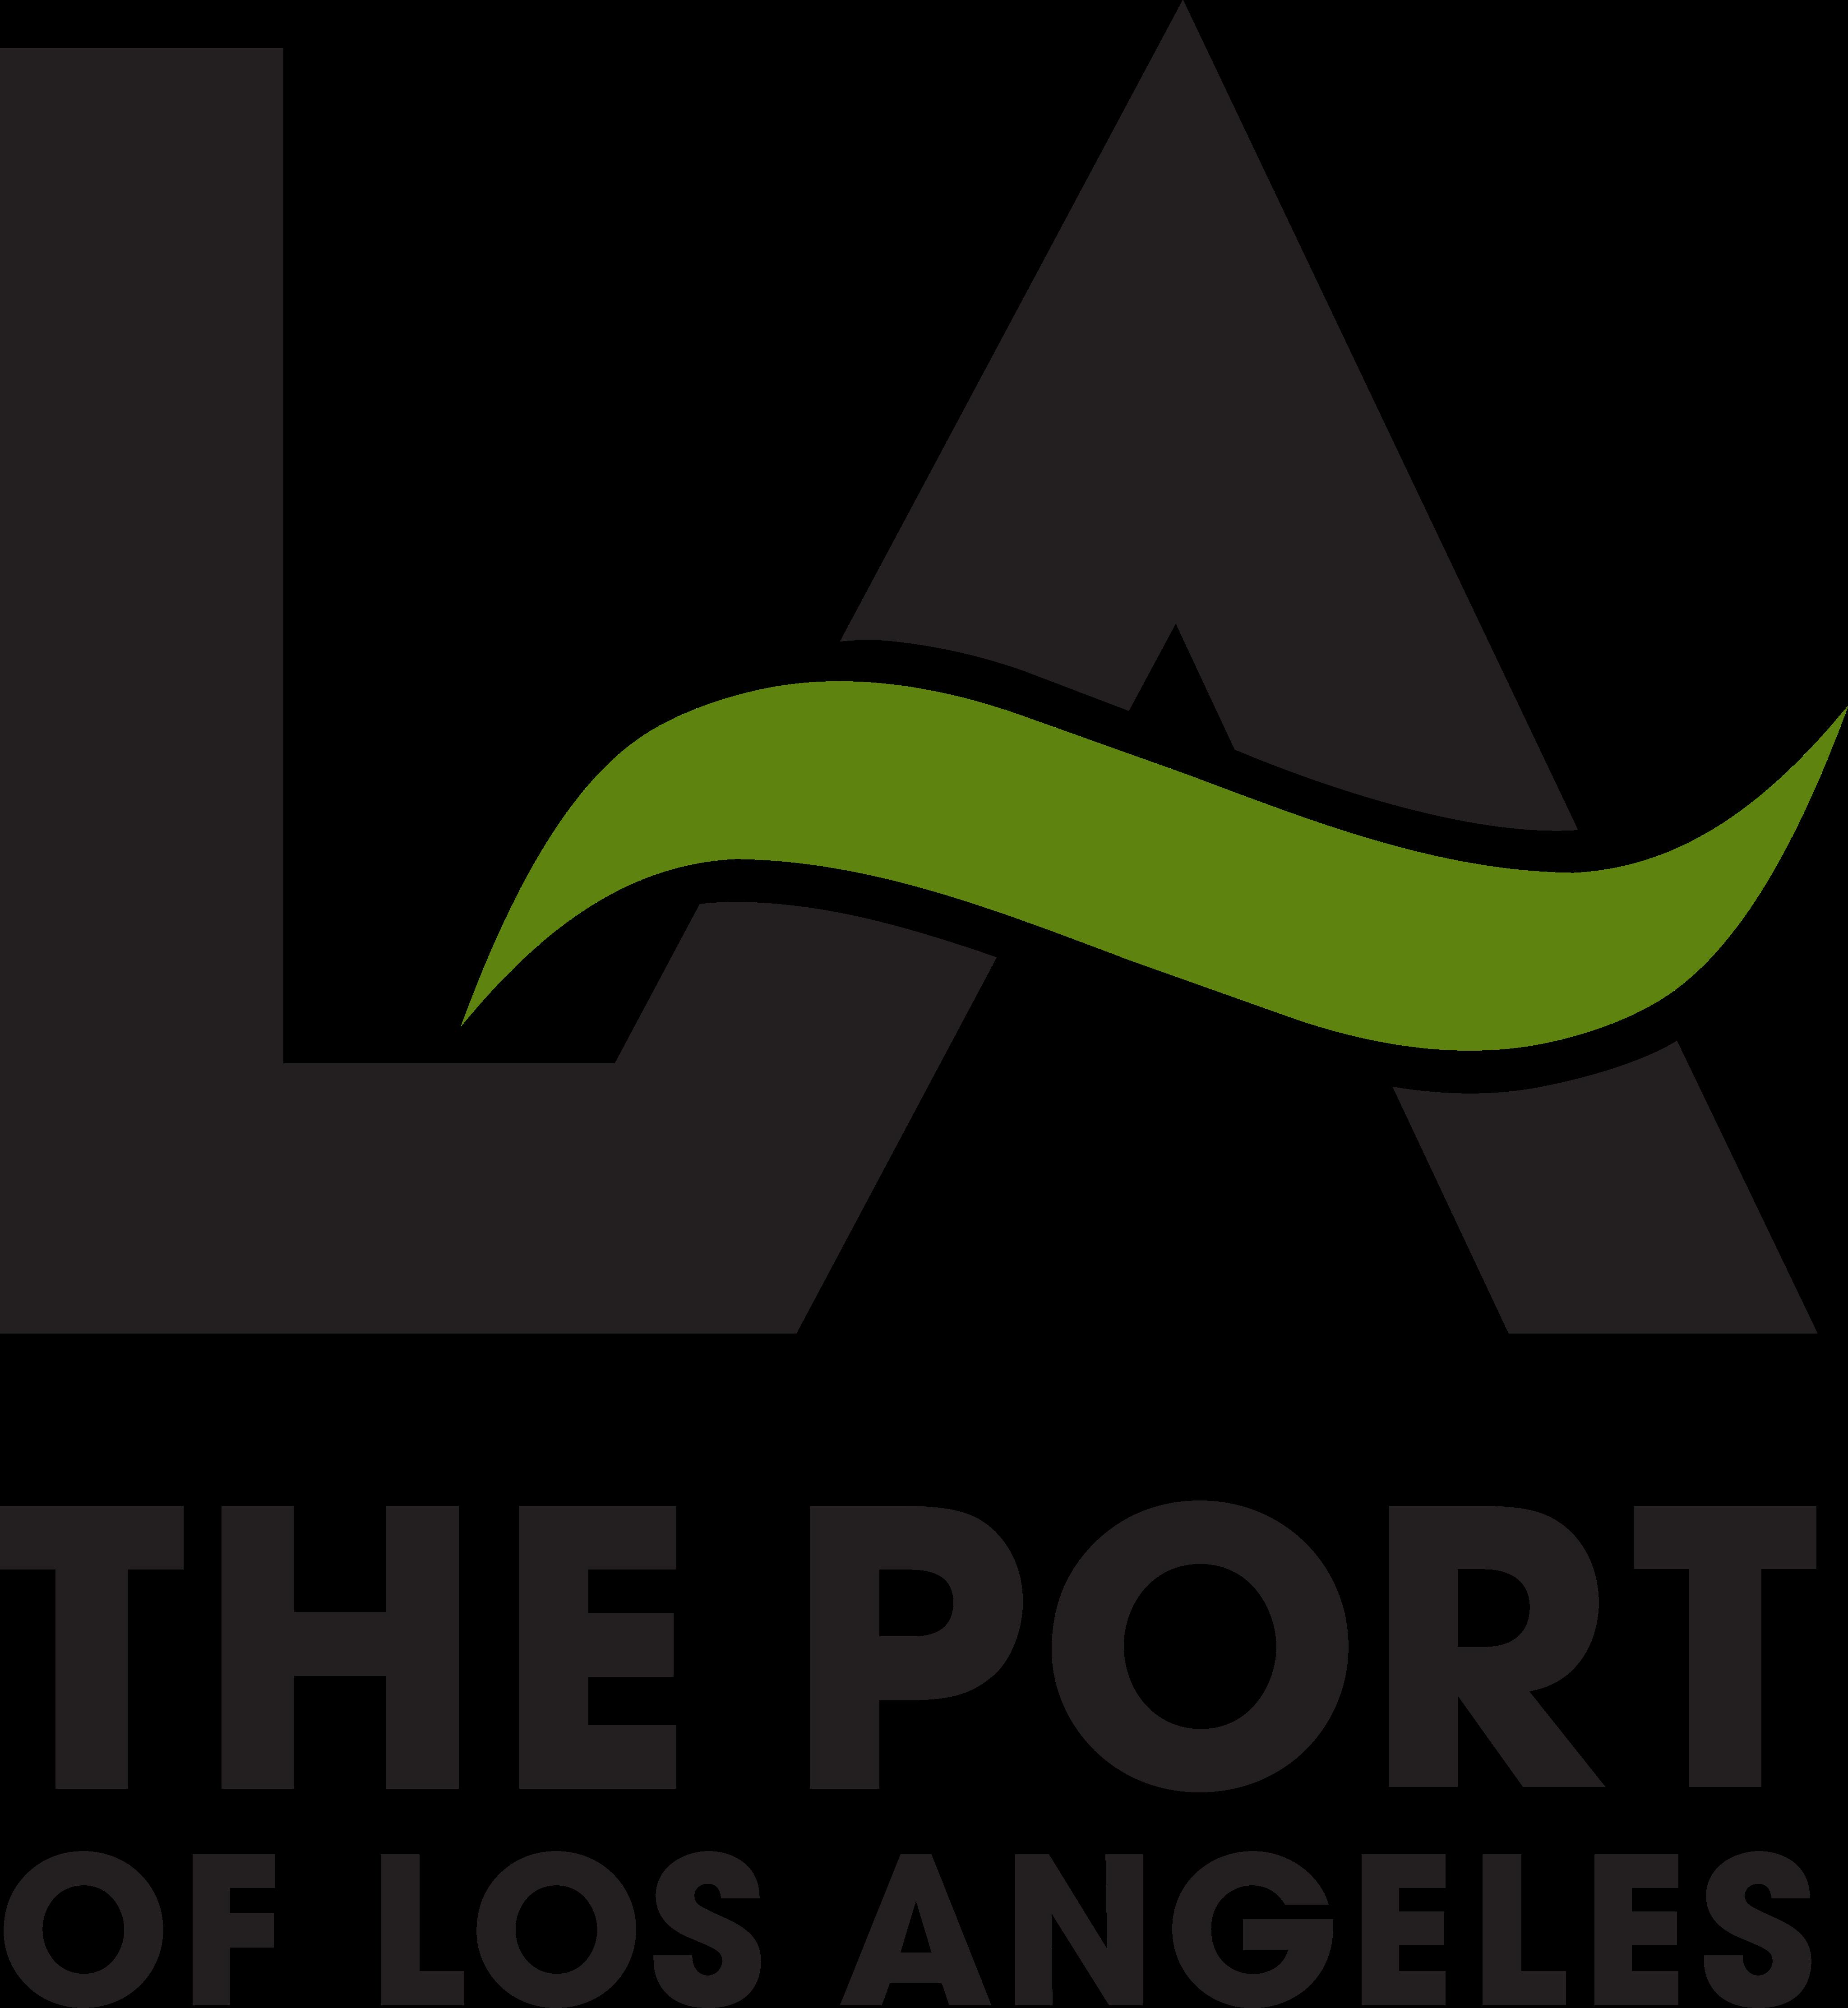 port of los angeles logo 1 - Port of Los Angeles Logo